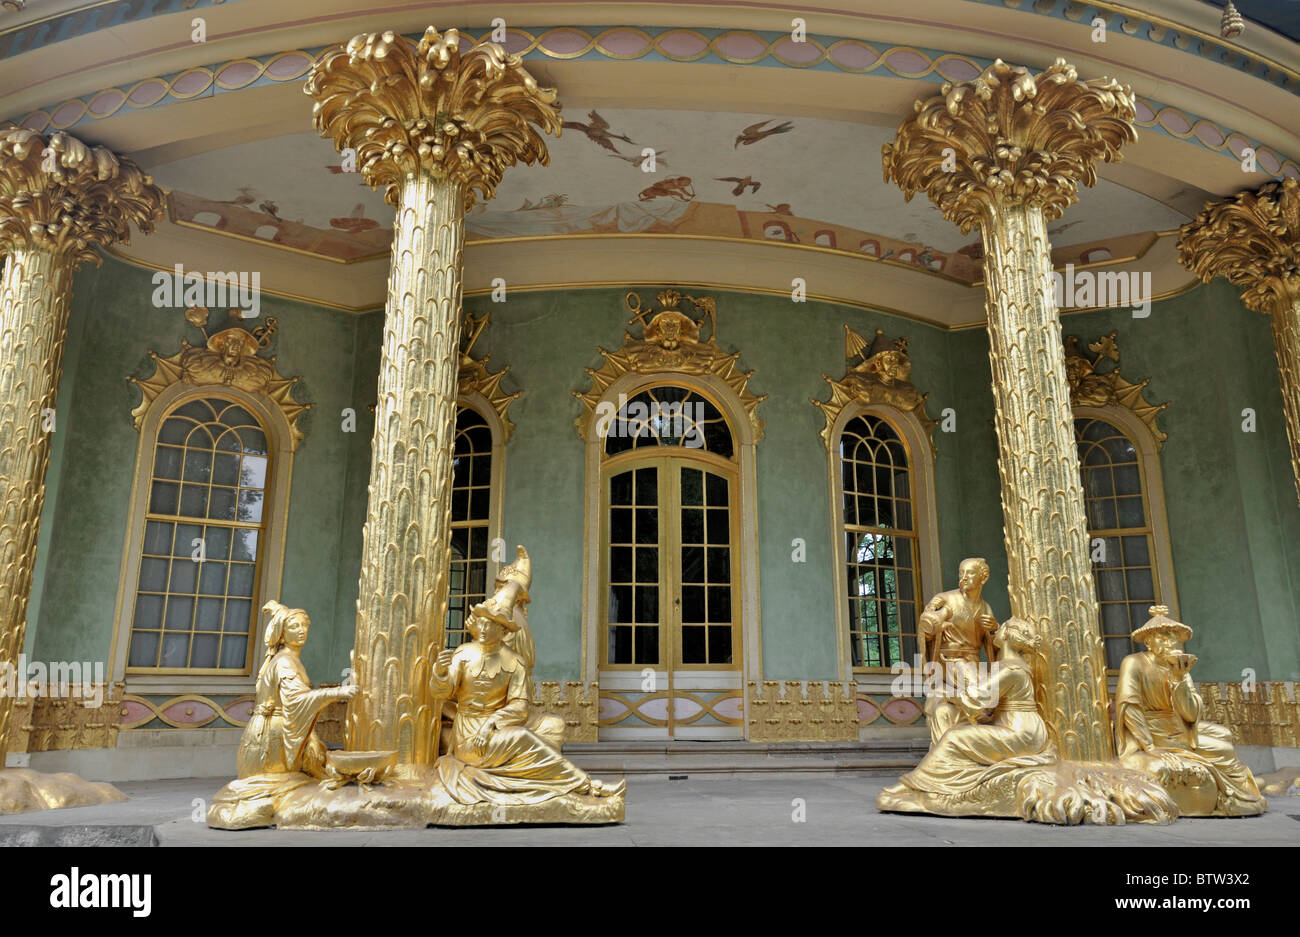 The Chinese tea house in Sanssouci Palace Potsdam, Germany Europe, UNESCO World heritage - Stock Image